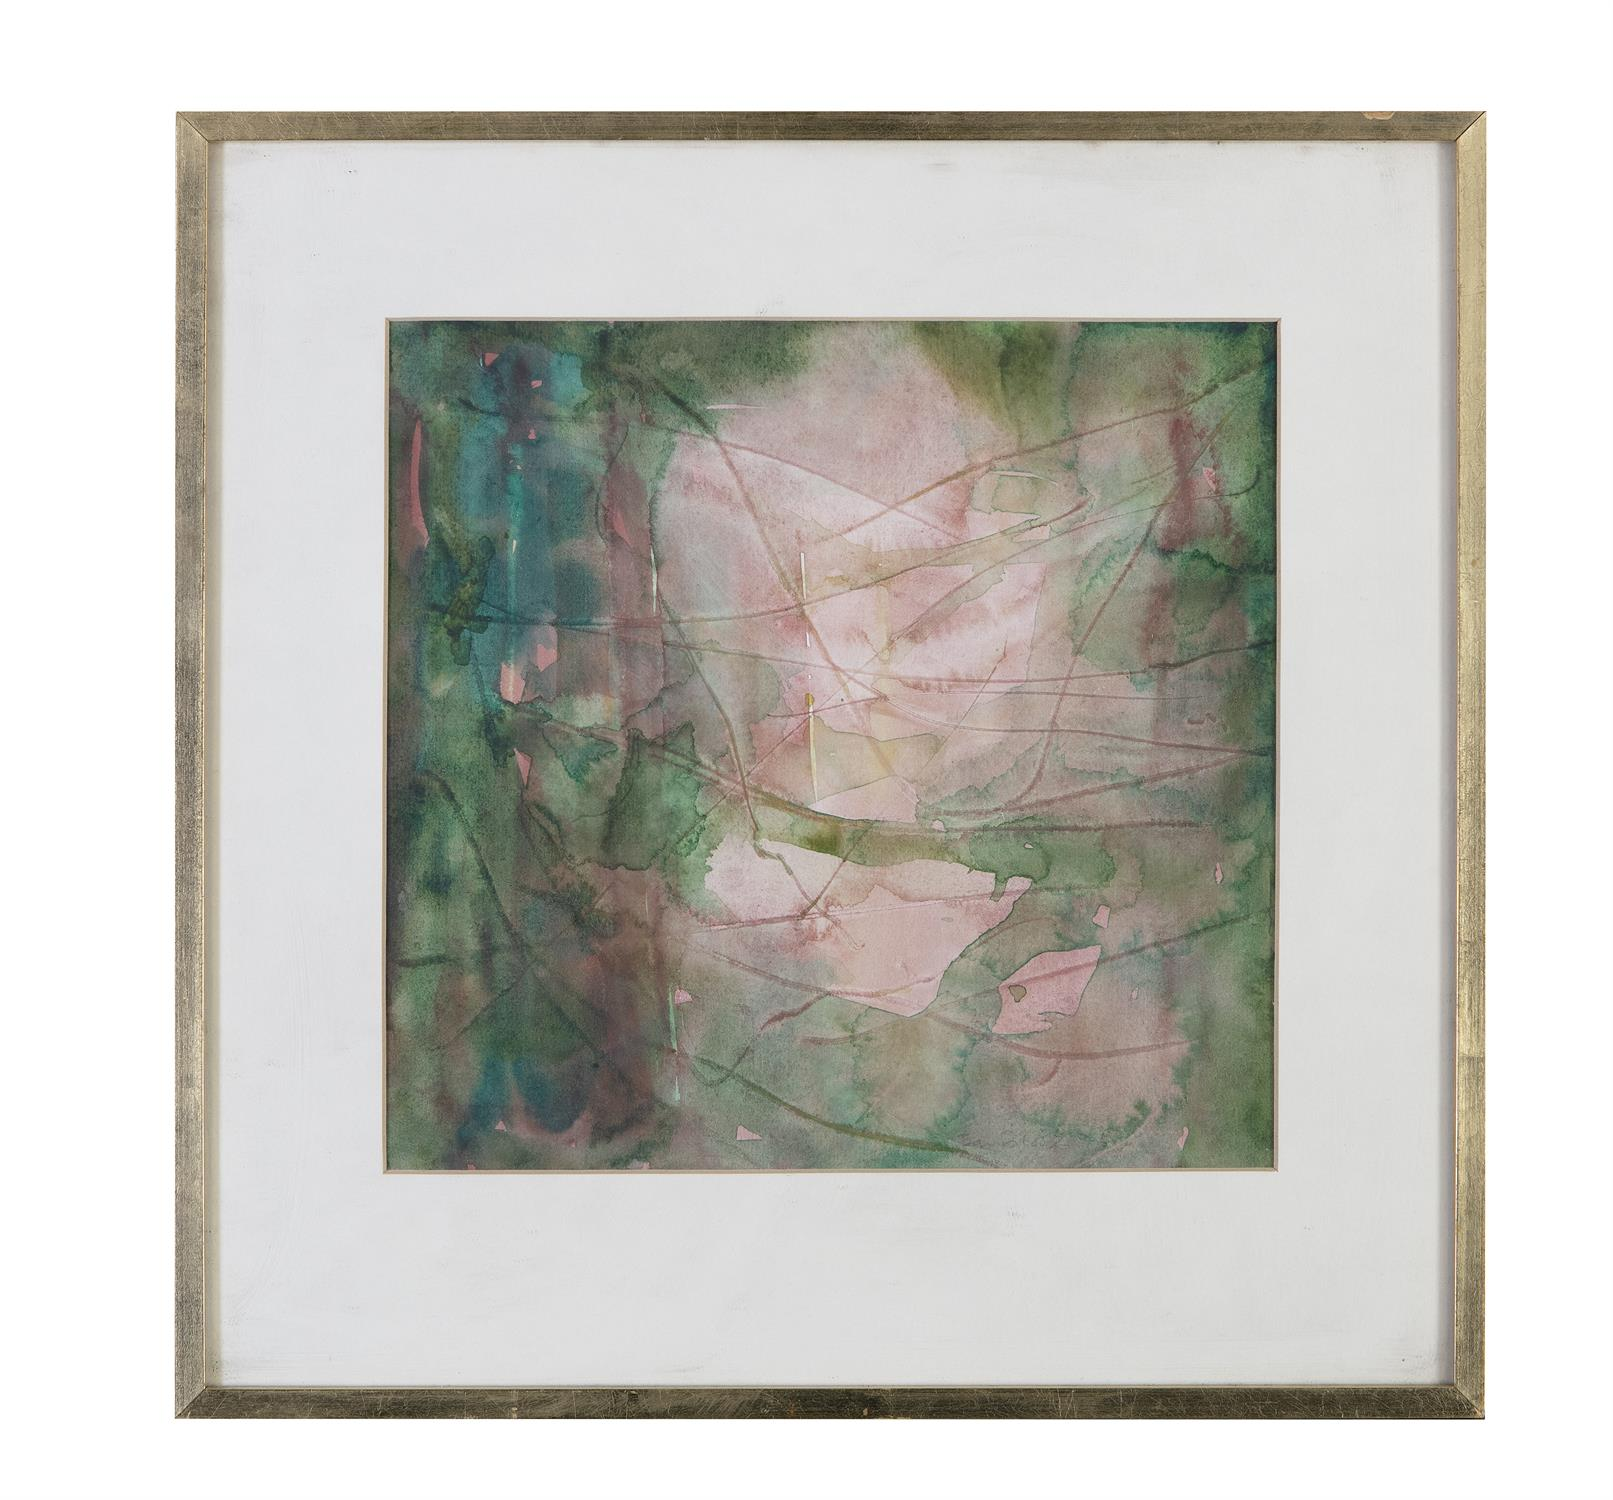 Barrie Cooke HRHA (1931-2014) Light in the Jungle 5 Watercolour, 26.5 x 26.5cm (10½ x